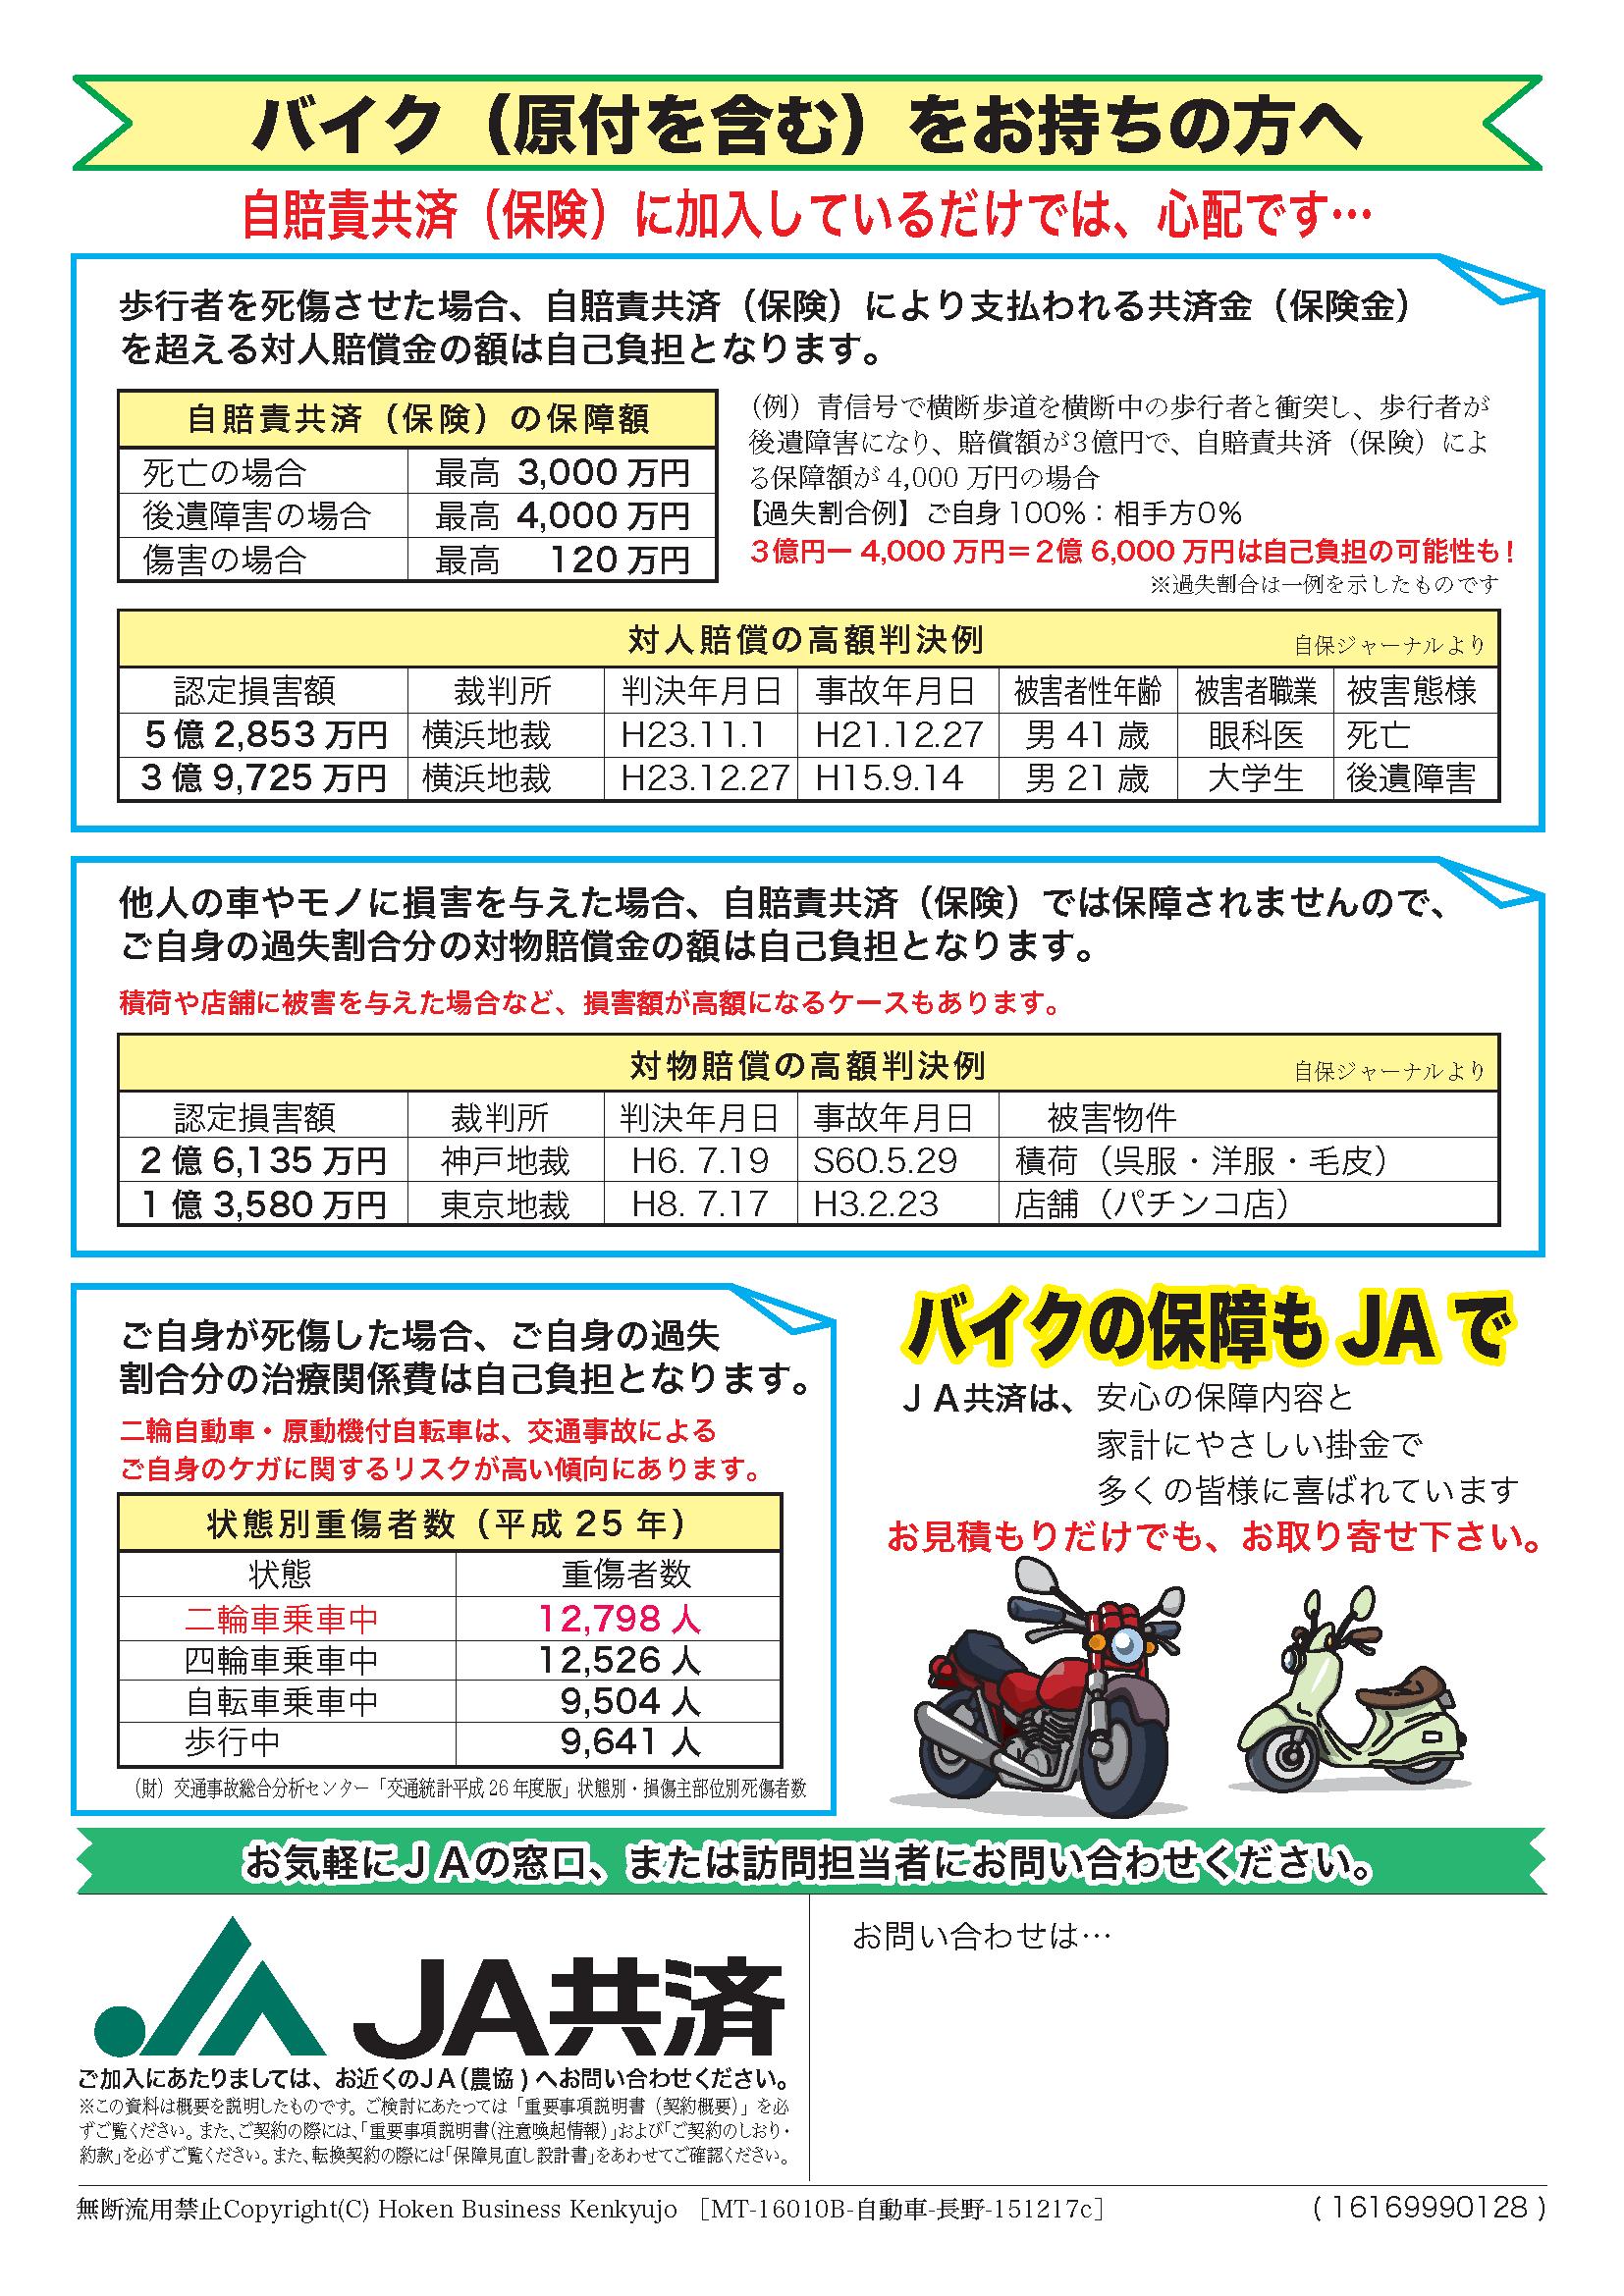 MT-16010-自動車_ページ_2.png